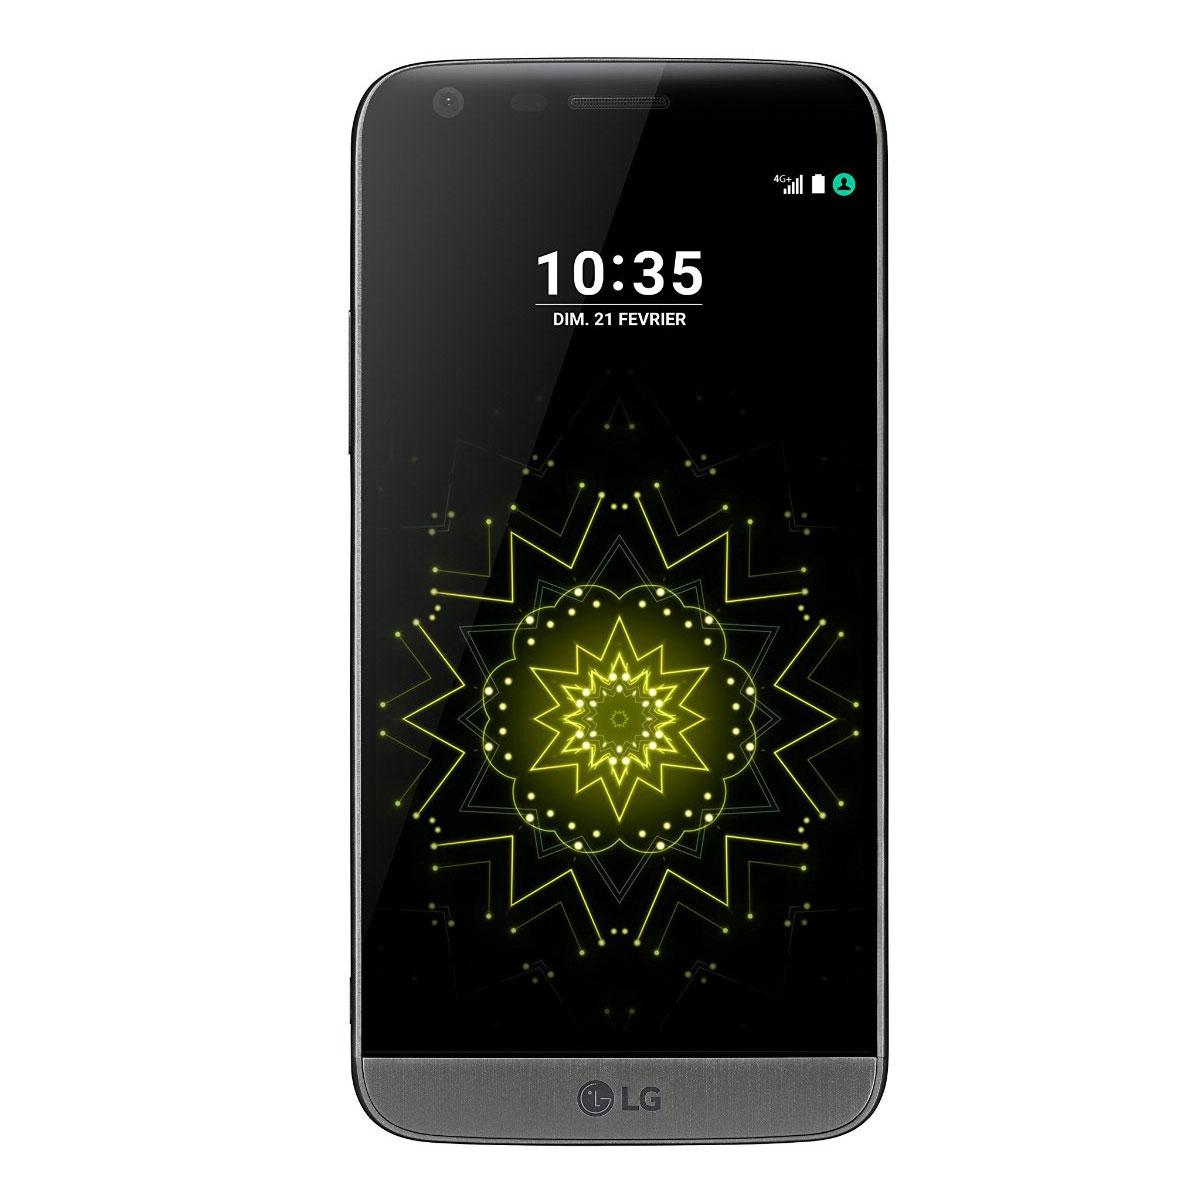 telephonie gps portable mobile smartphone c b